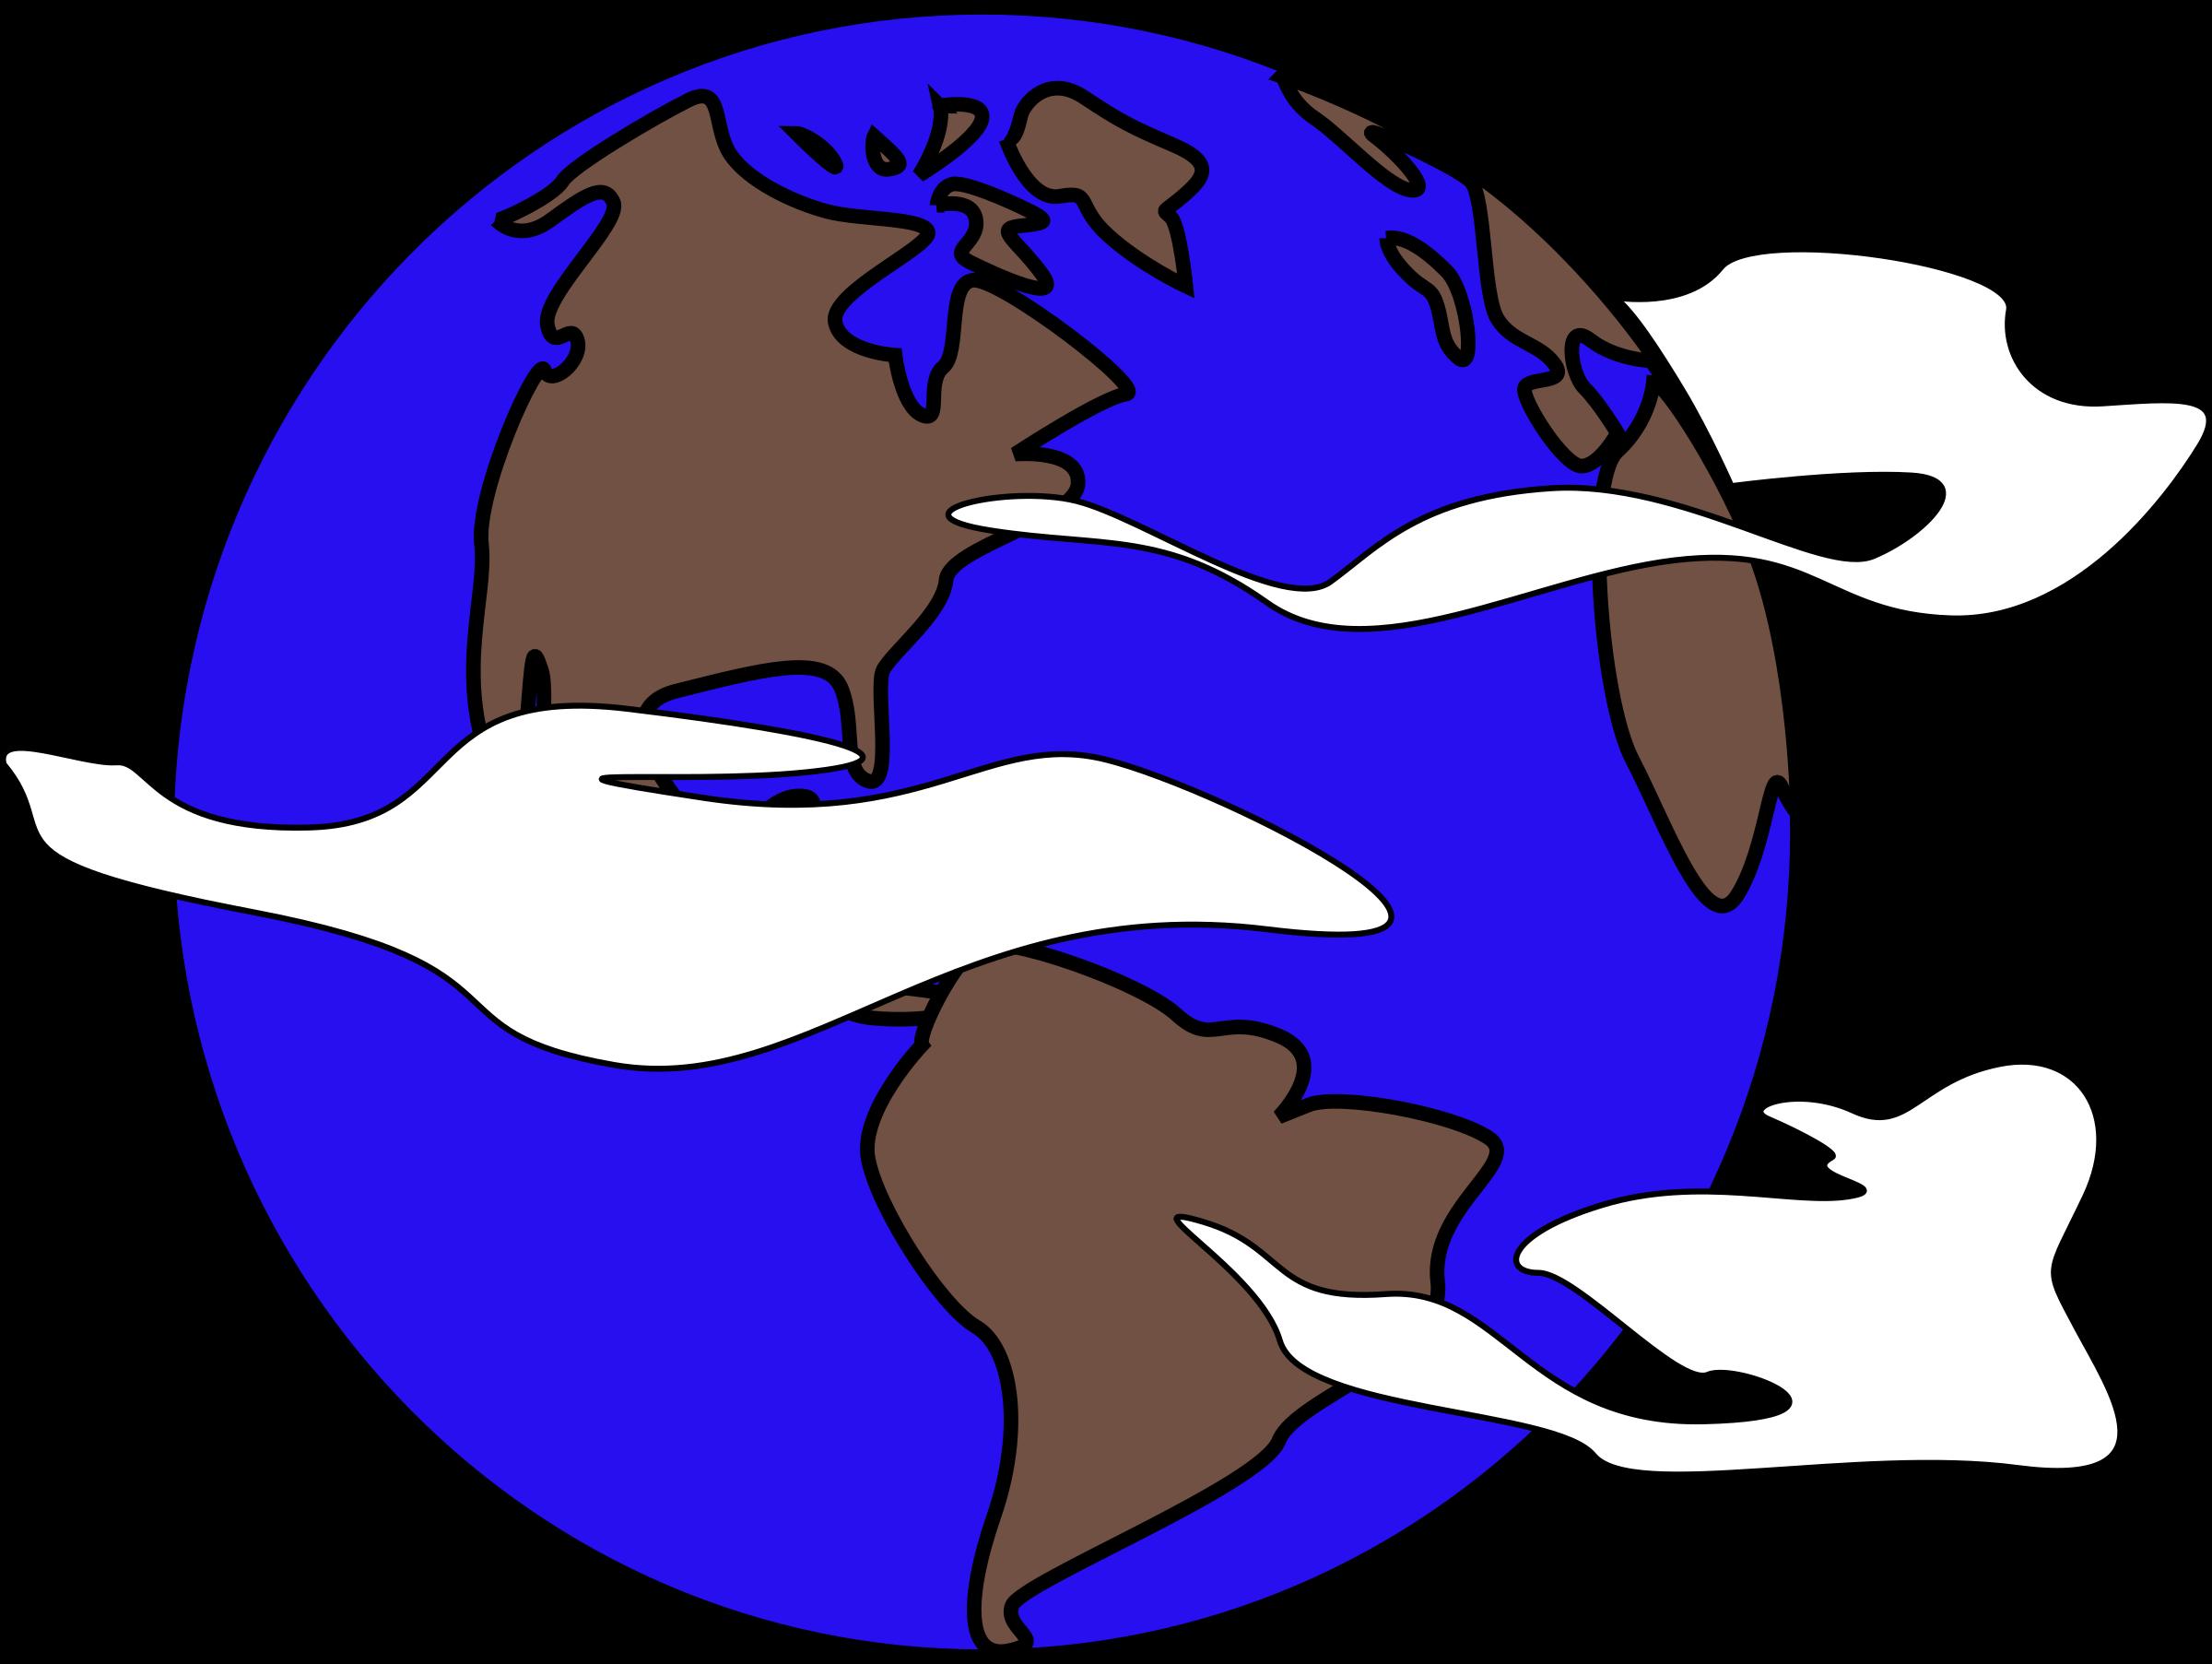 2400x1805 Globe Clip Art Images Free